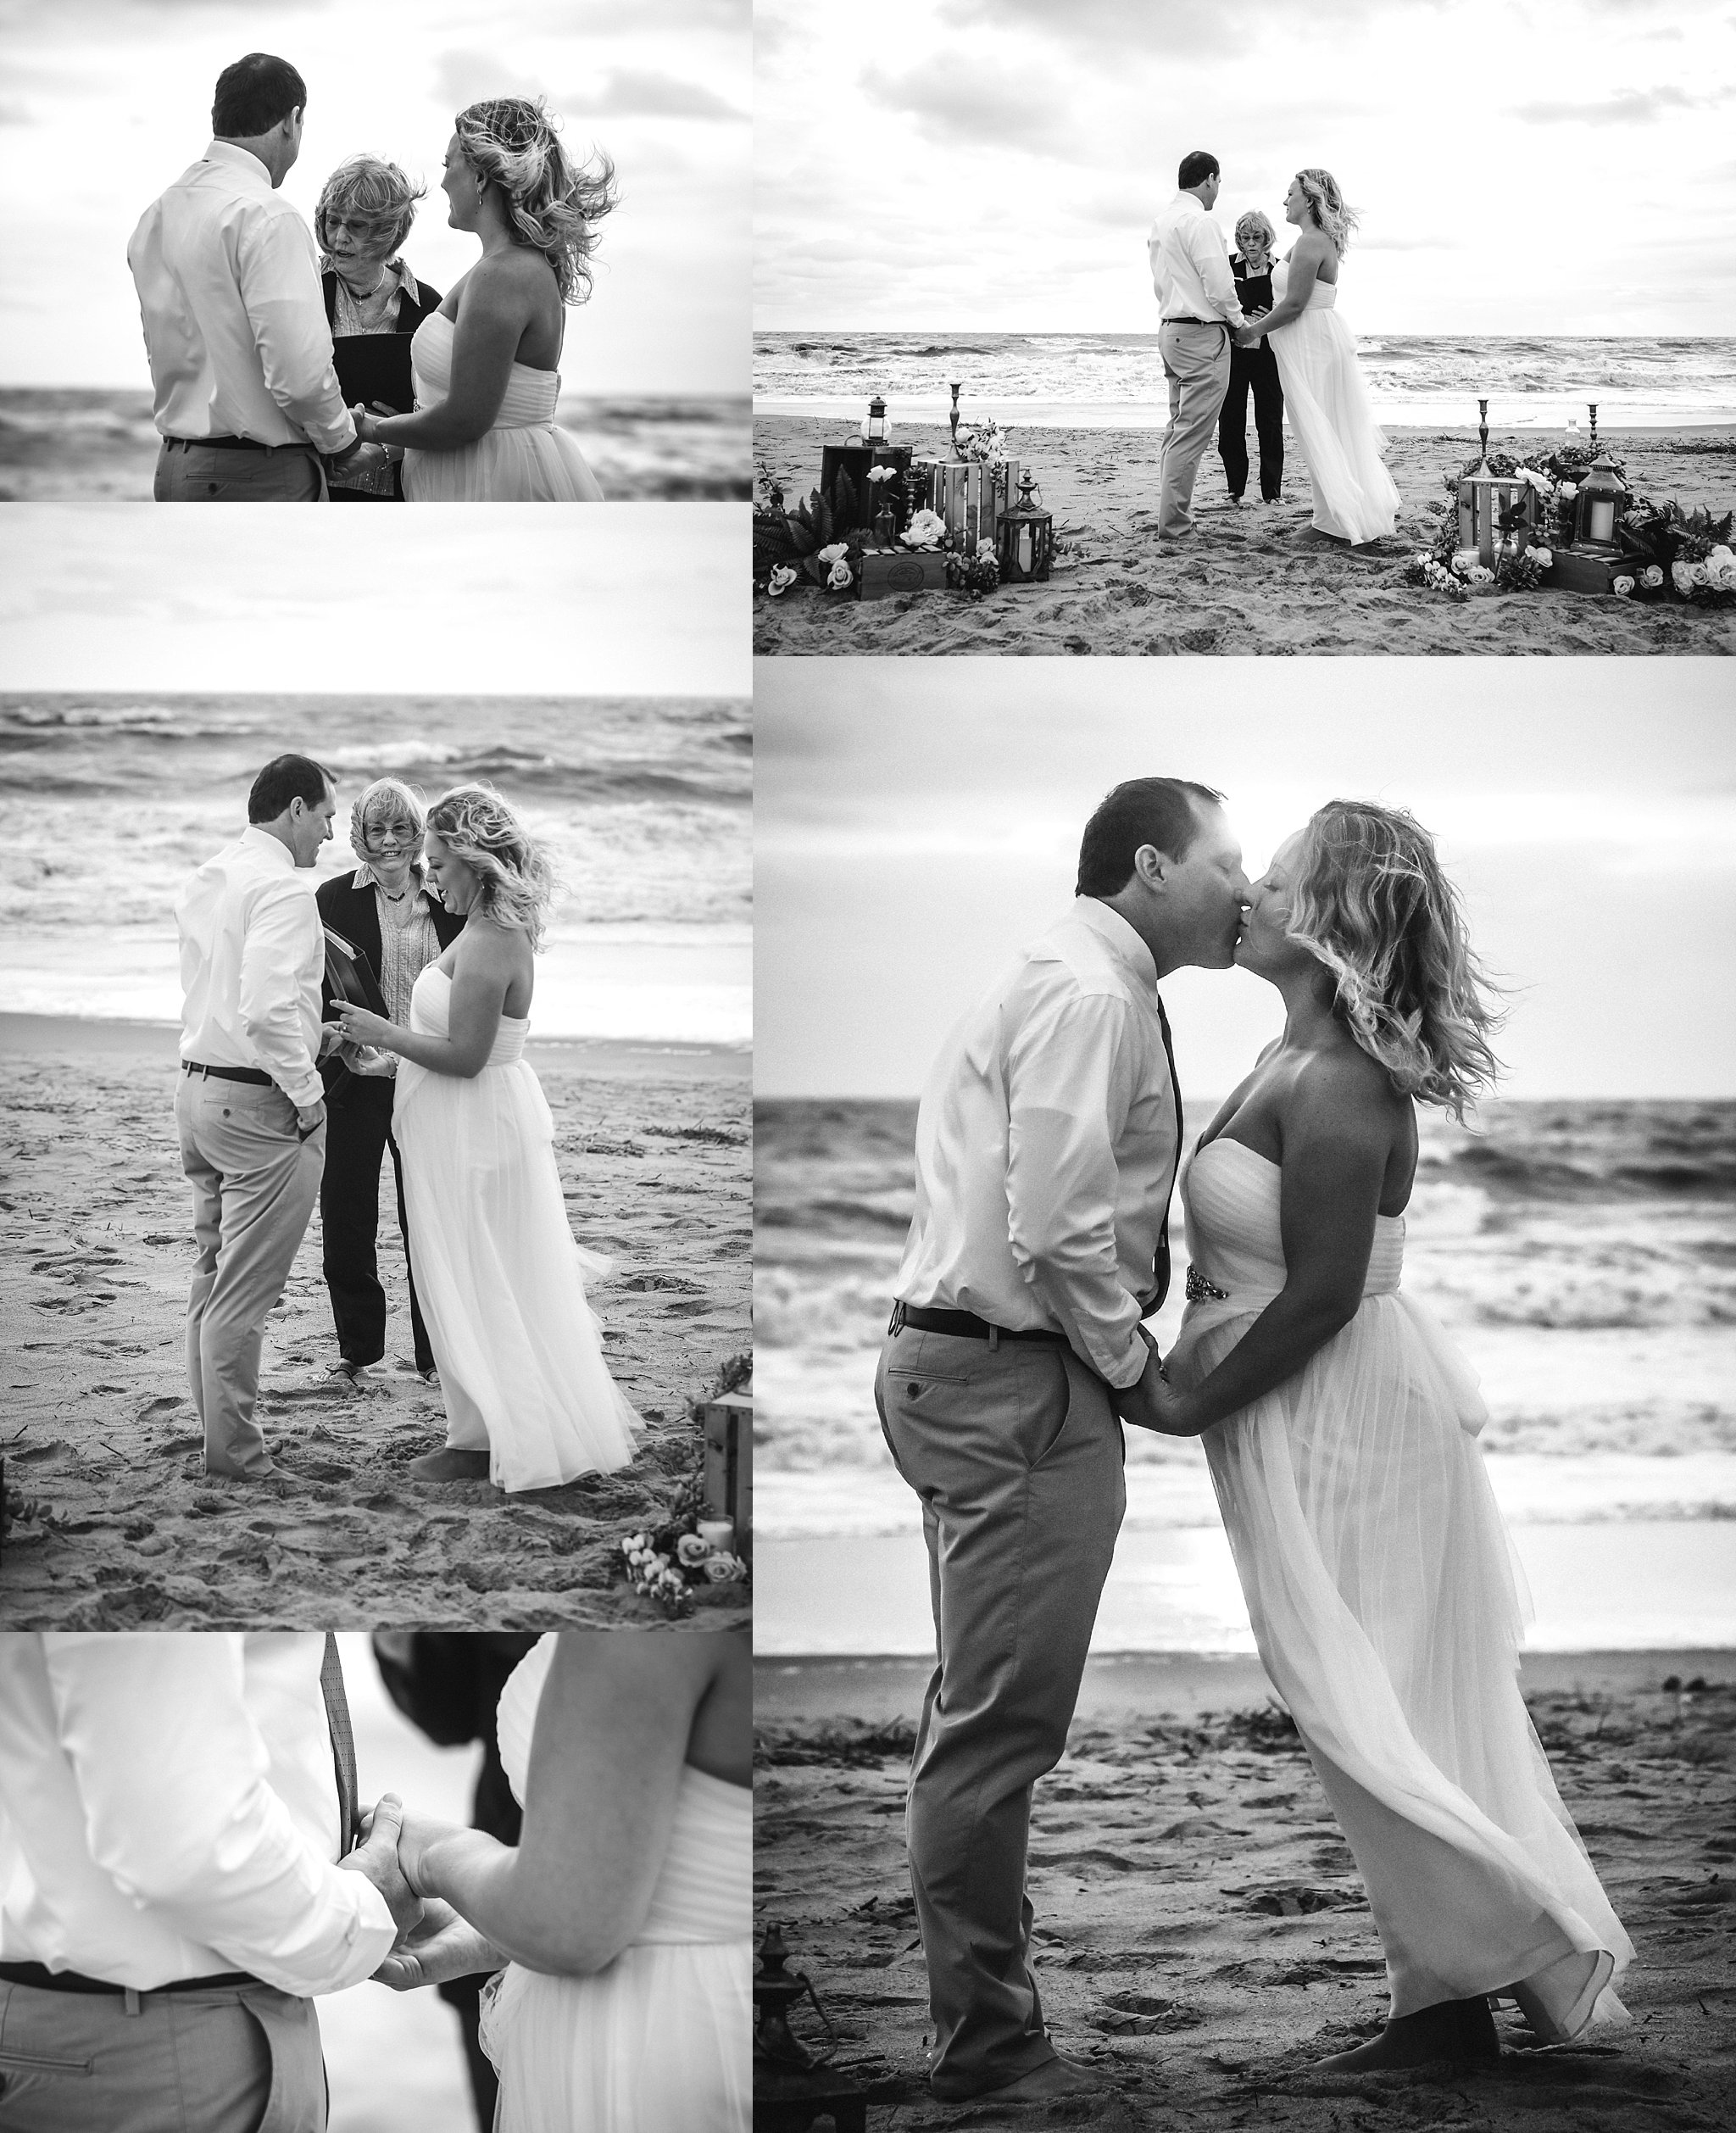 virginia-wedding-engagement-and-elopement-photographer-melissa-bliss-photography-beach-ceremony-at-sunrise-virginia-beach-norfolk-portsmouth-photographer